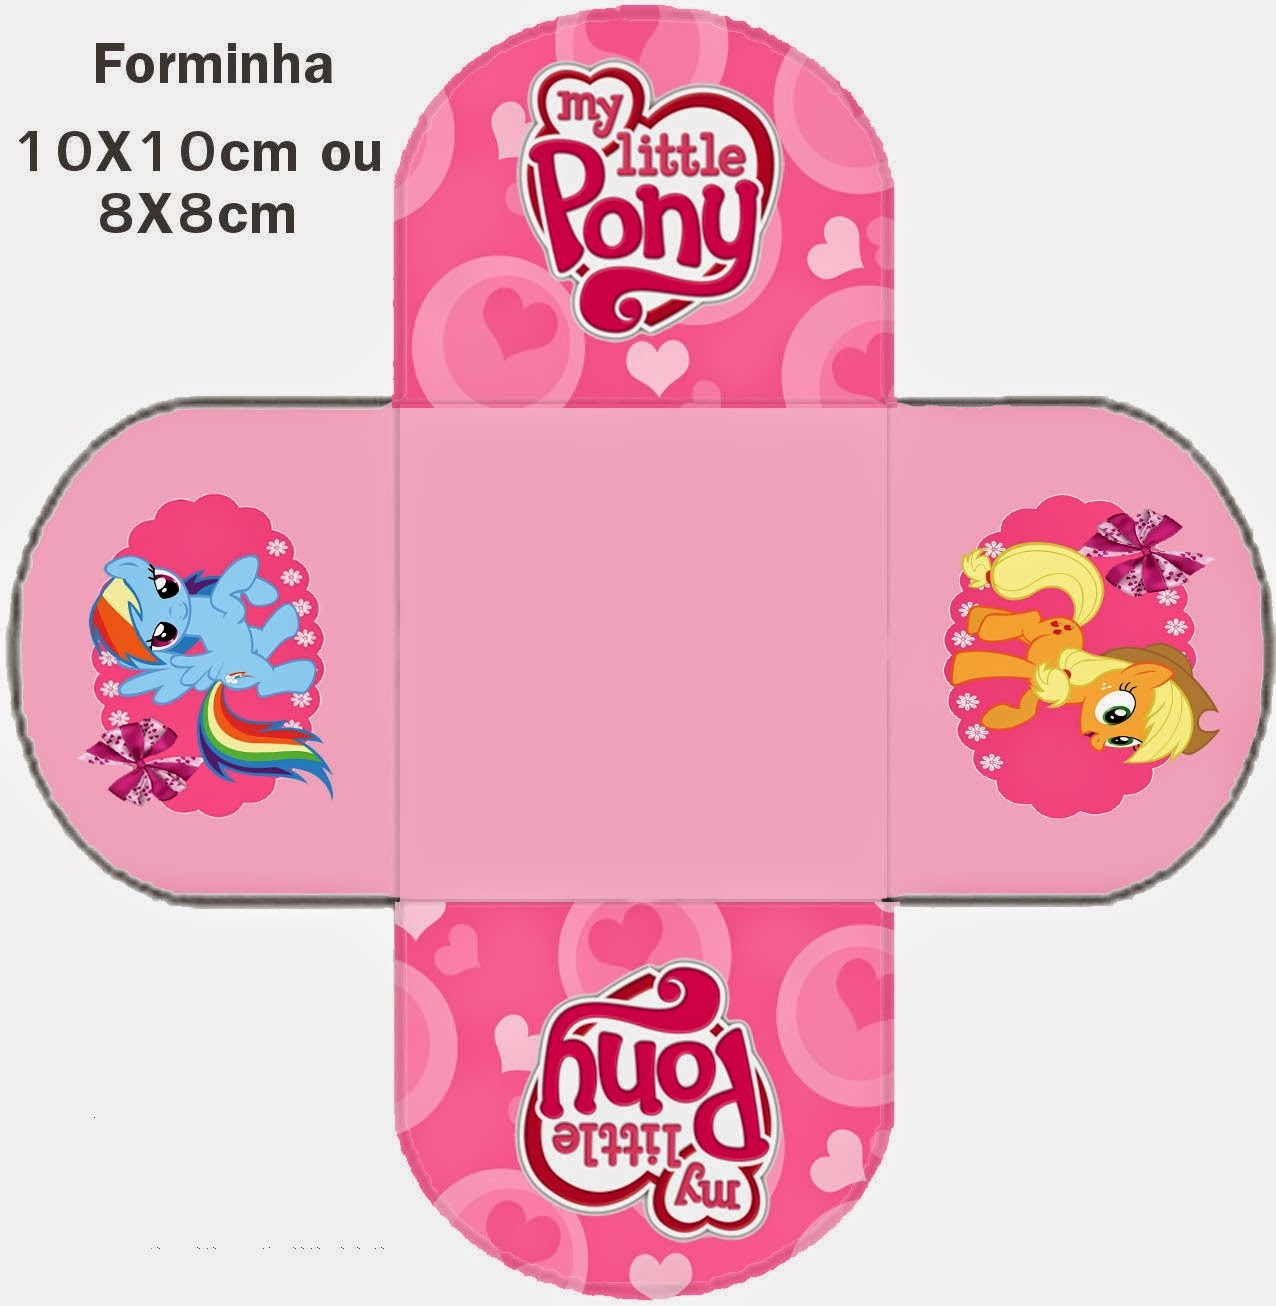 My Little Pony Free Printable Kit. - Oh My Fiesta! For Geeks - Free Printable My Little Pony Cupcake Toppers